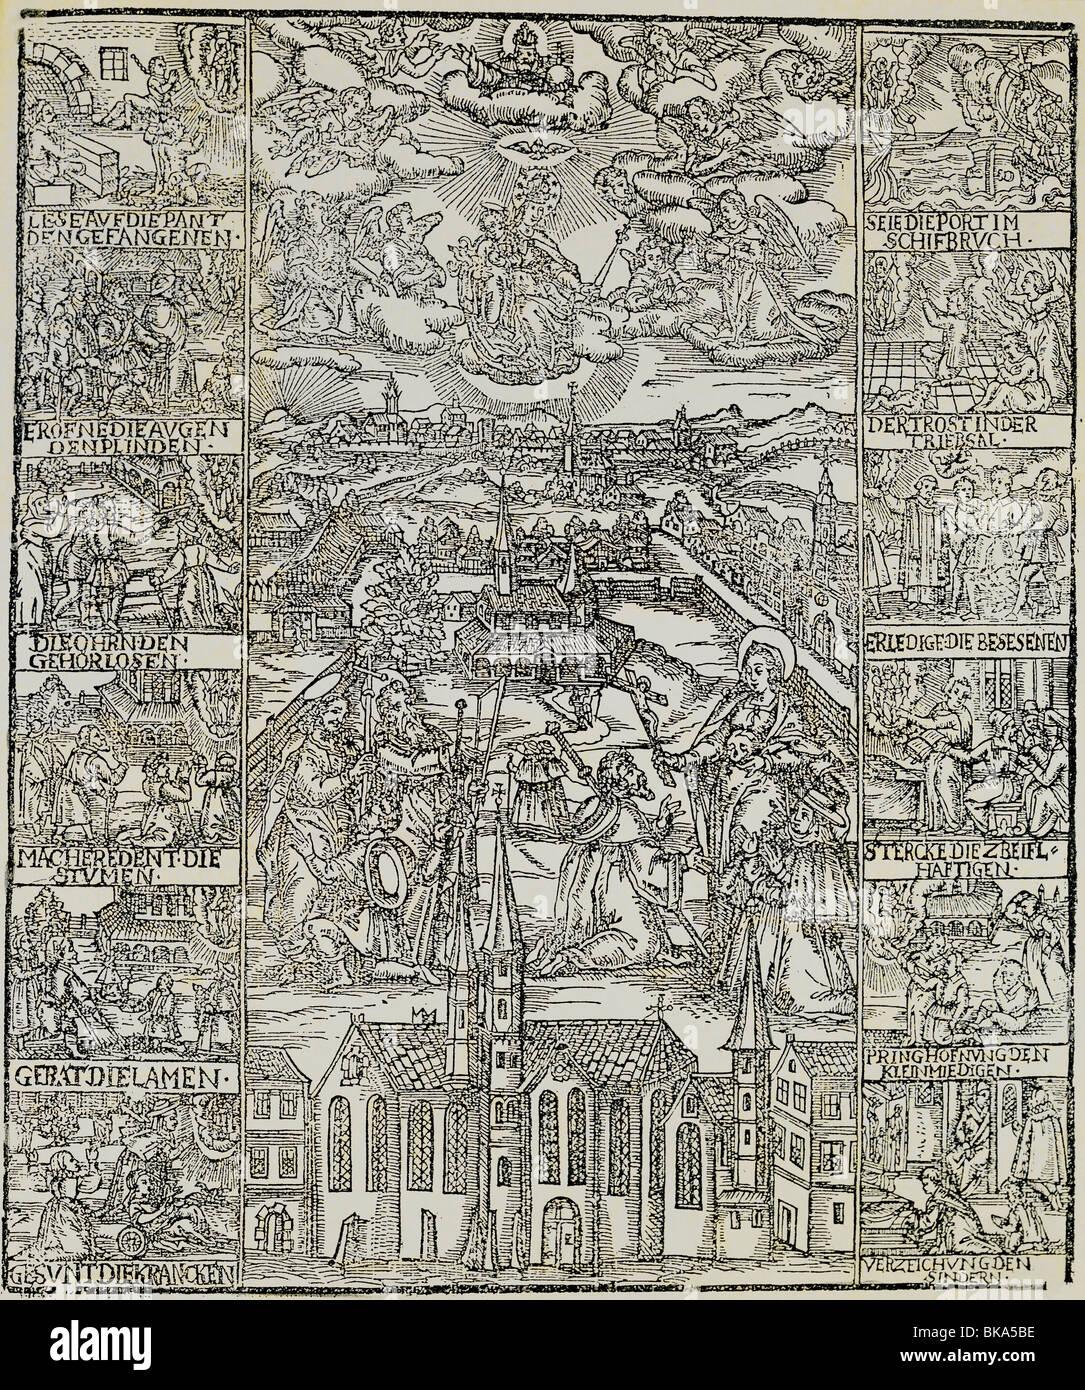 religion, christianity, pilgrimage, Altötting, woodcut, Master of the Danube School, circa 1540, Additional - Stock Image